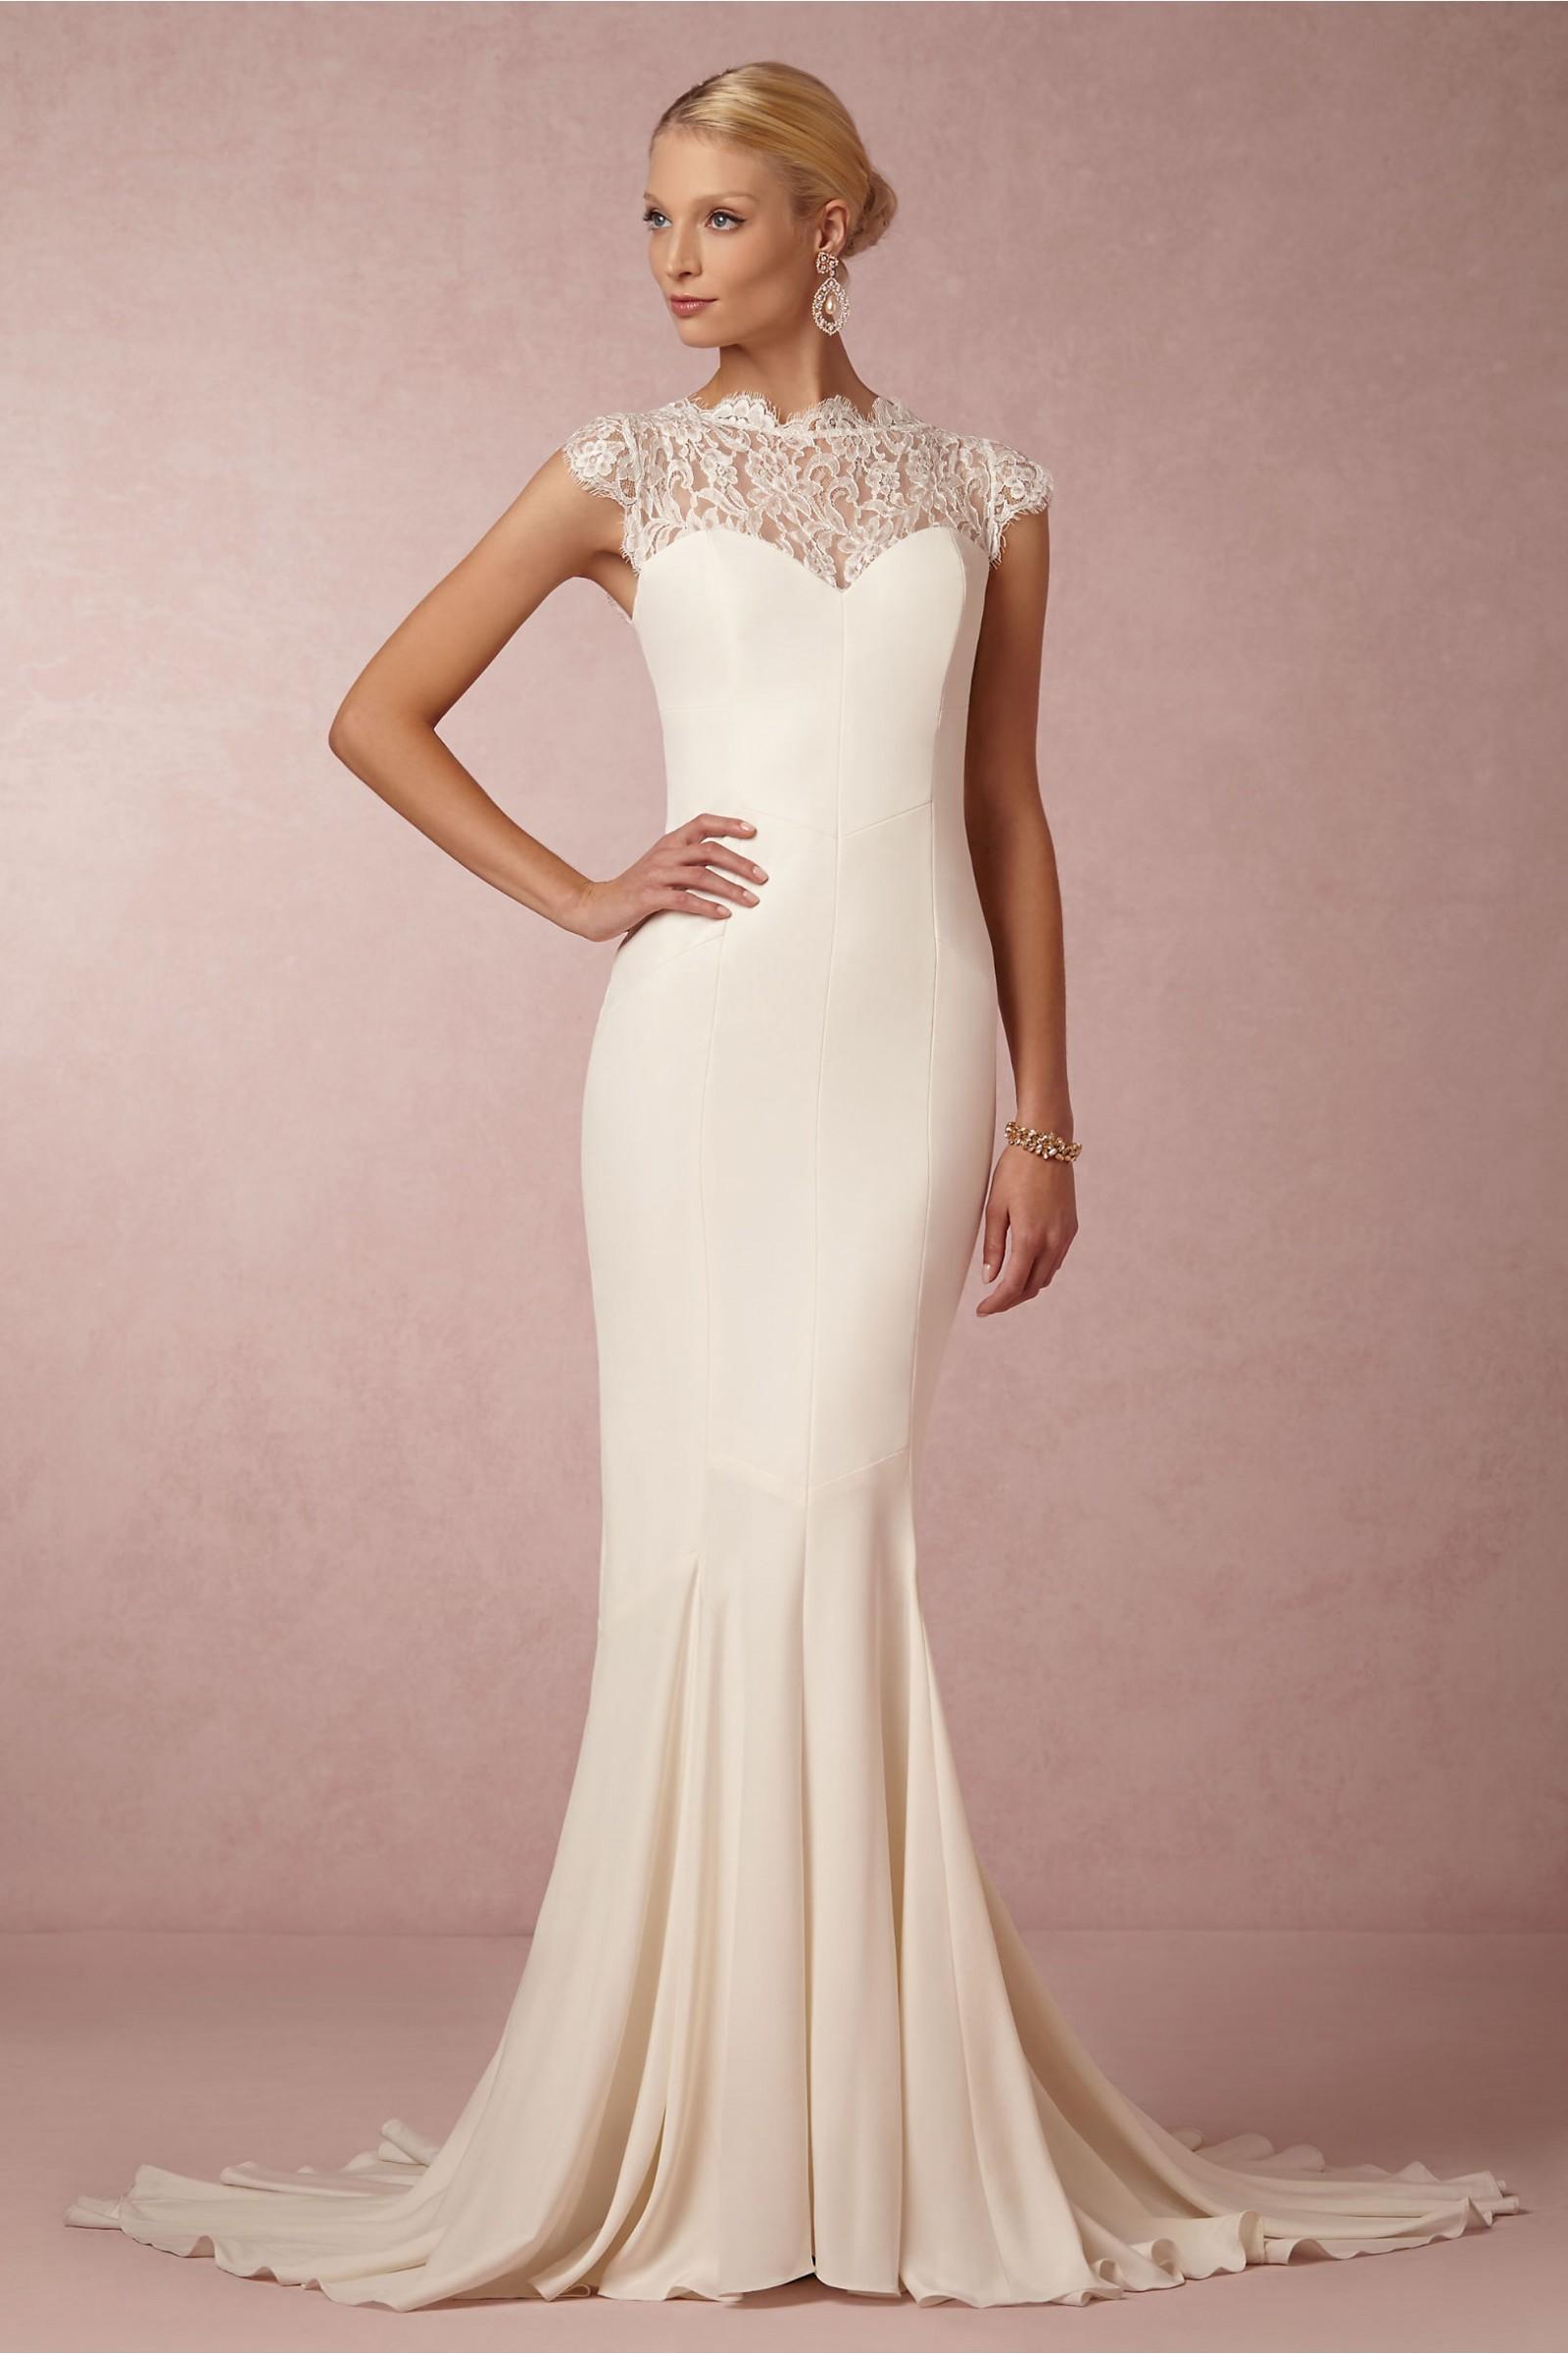 Nicole Miller Lauren Gown - Used Wedding Dresses - Stillwhite